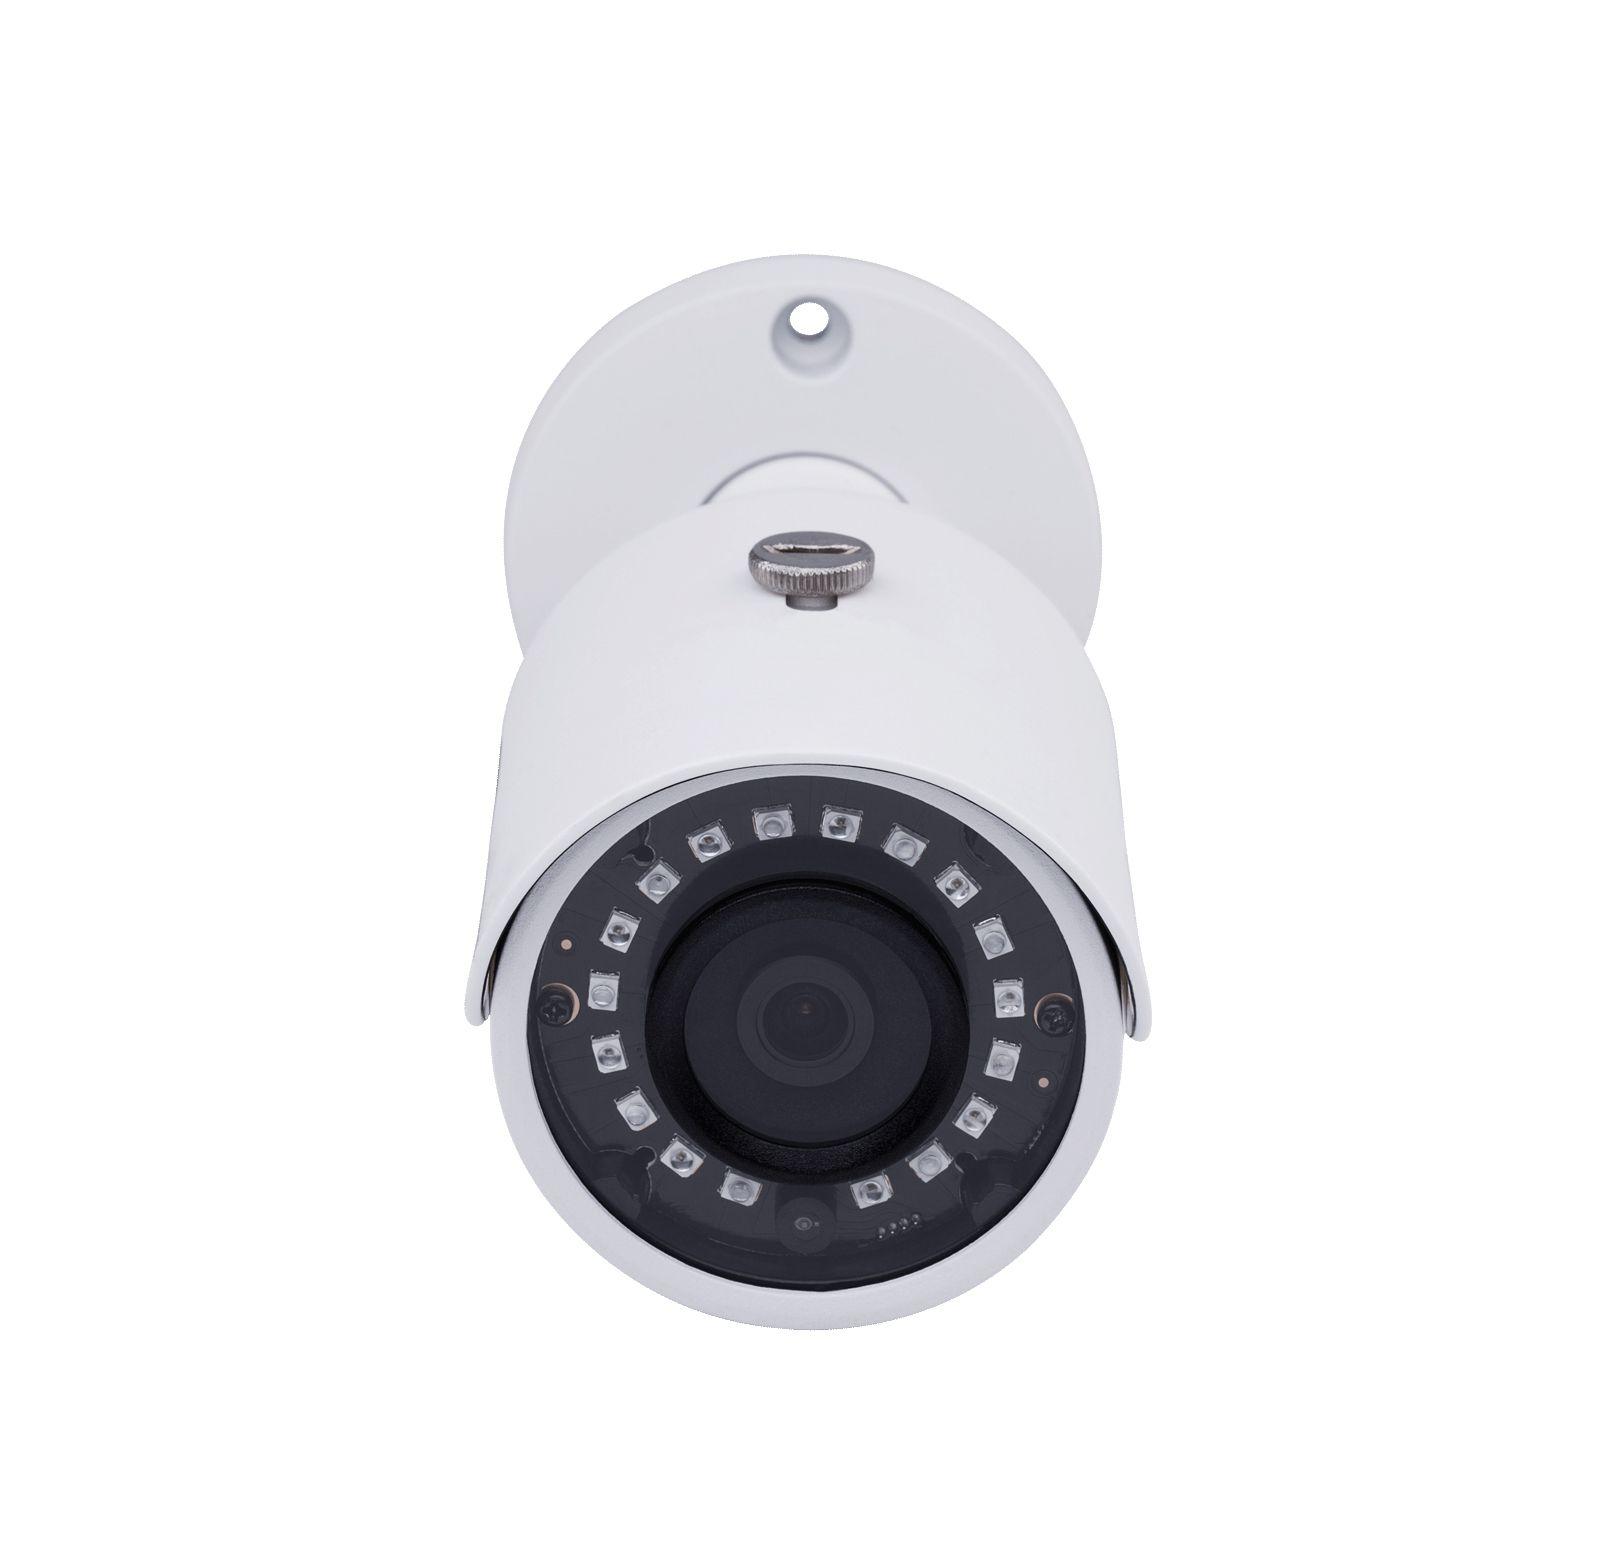 Câmera HDCVI VHD 5240 B SL